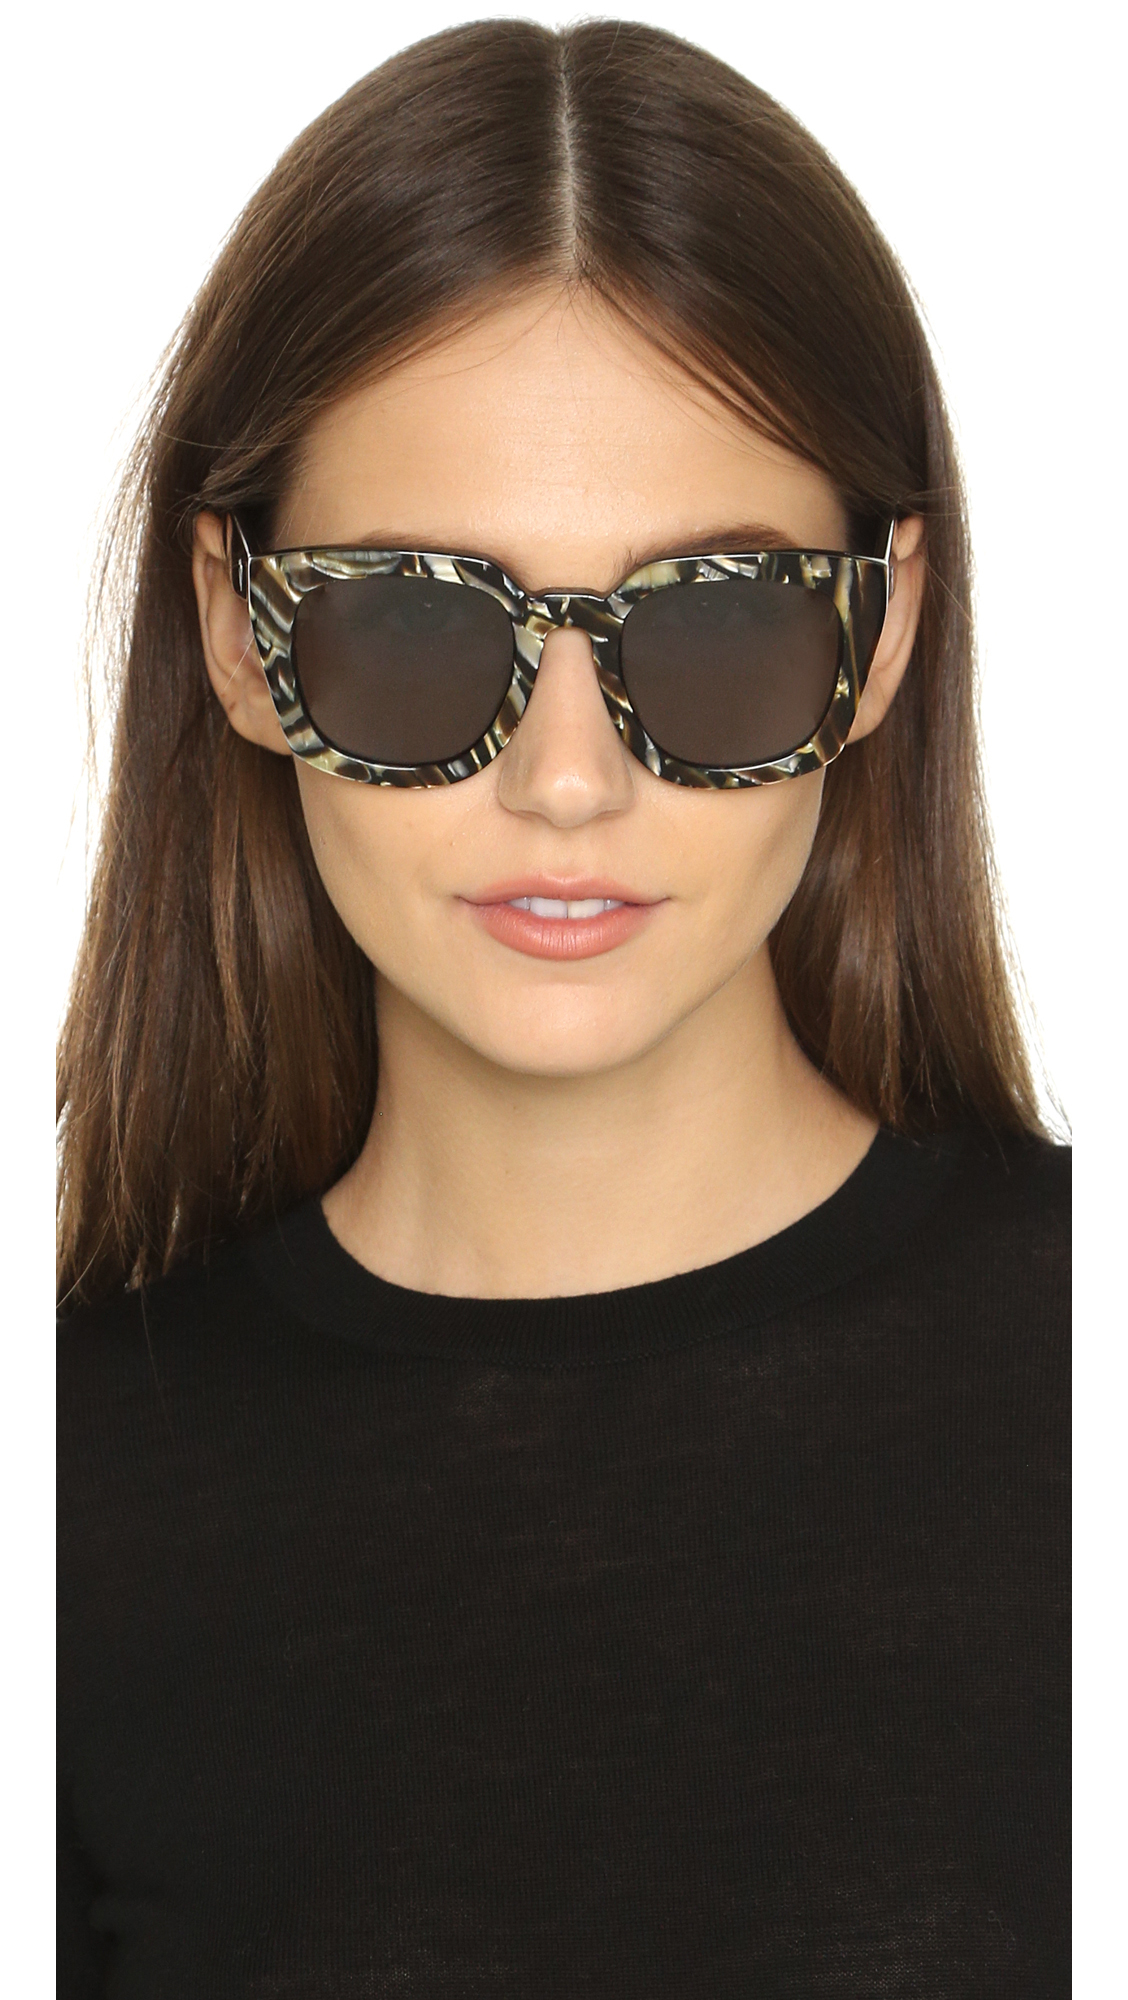 71c5aa74860 Valley Eyewear Orbis Sunglasses in White - Lyst